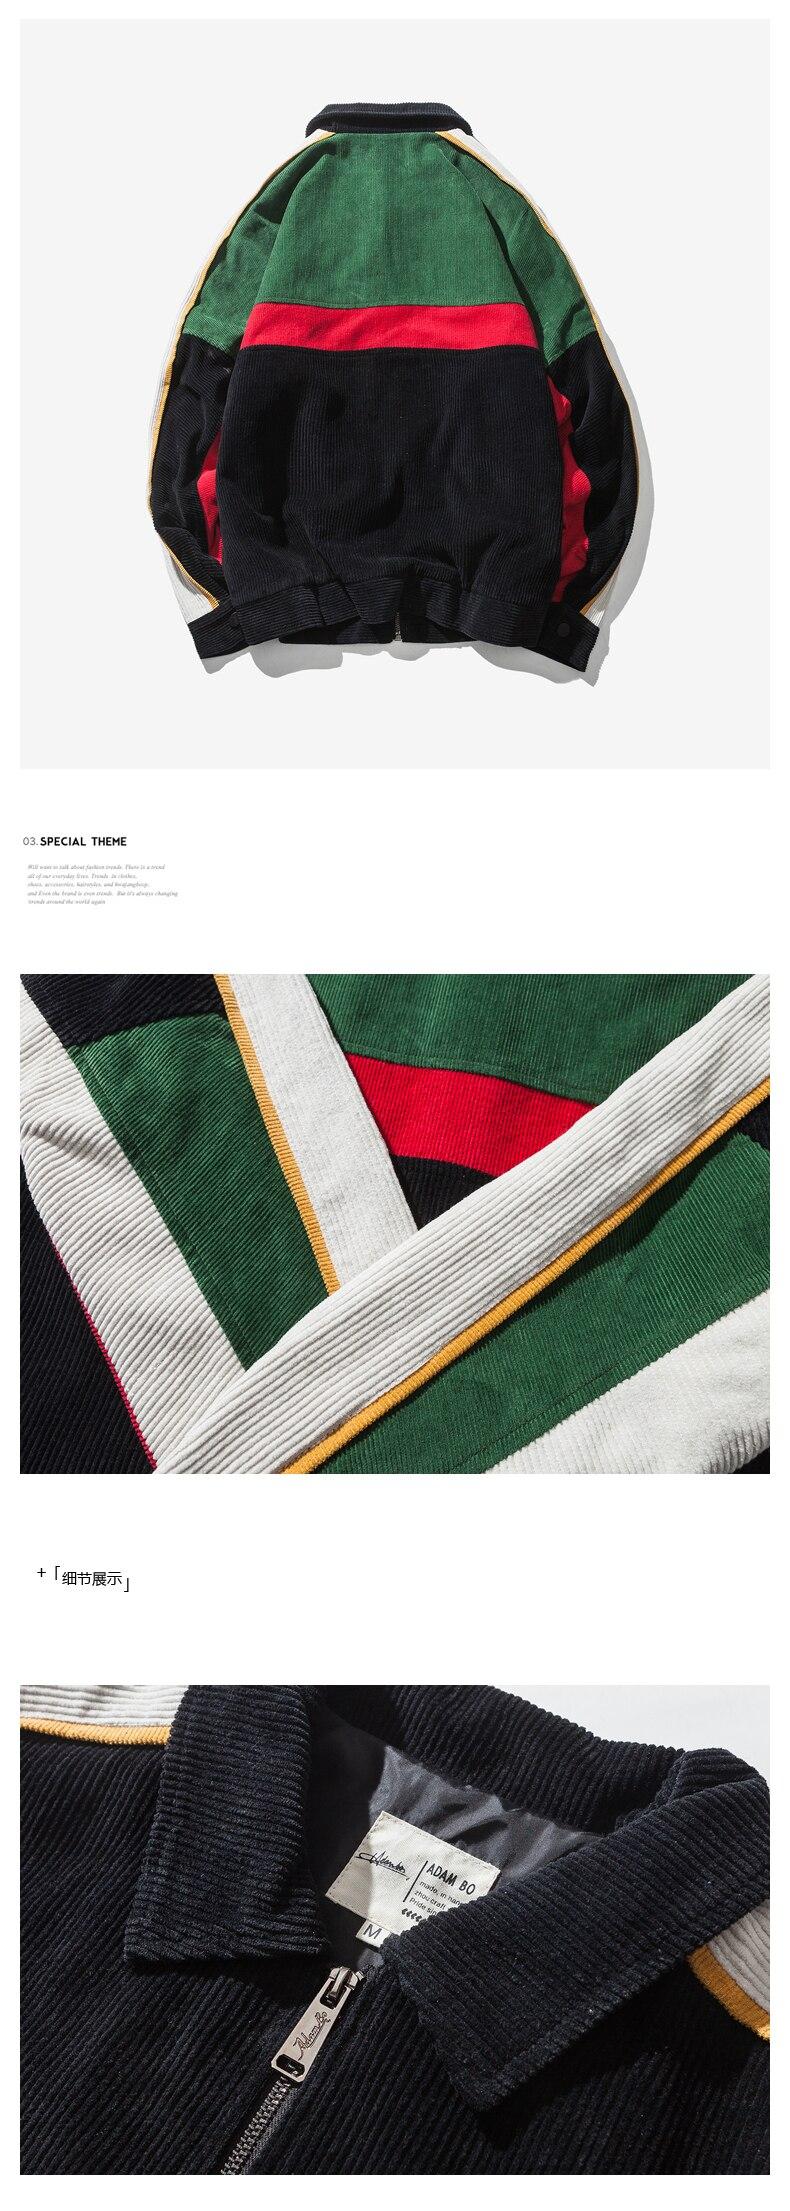 YuWaiJiaRen Autumn Spring Mens Classic Corduroy Jacket Lengthy Sleeve Zipper Free Patchwork Embroidery Males's Clothes HTB1X2b5d7fb uJjSsD4q6yqiFXal